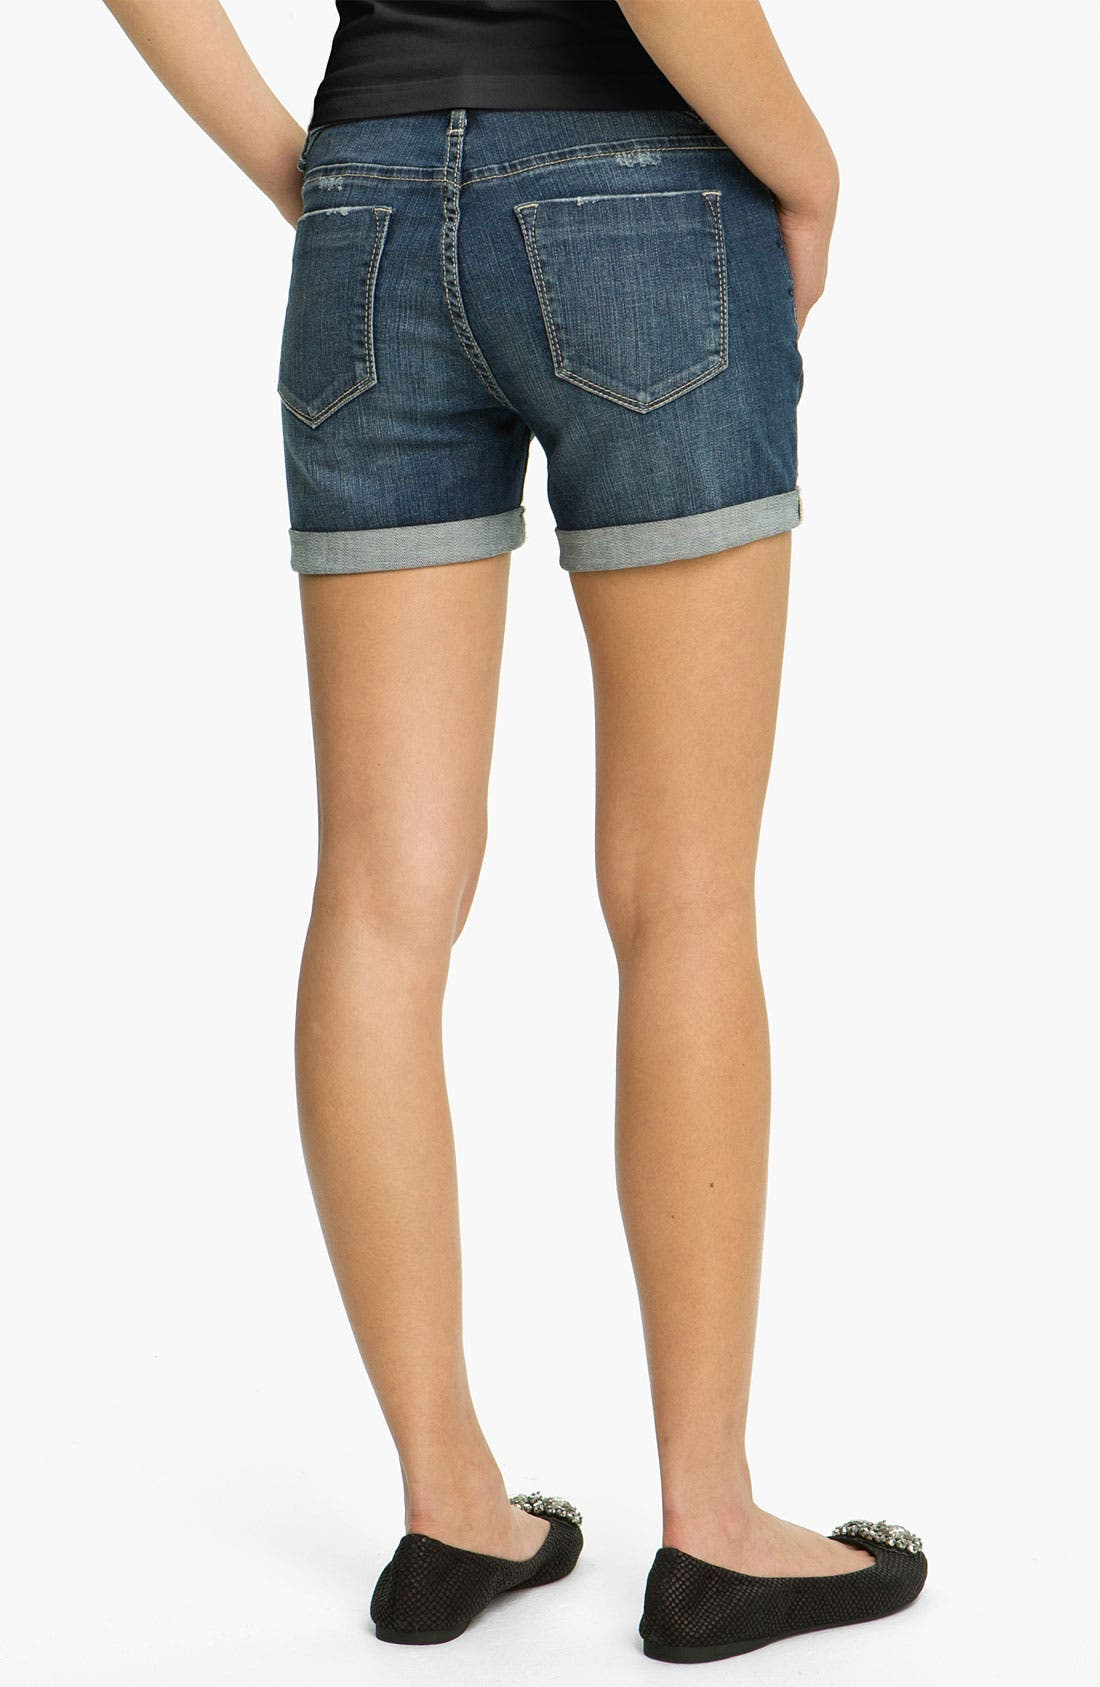 Alternate Image 1 Selected - Vigoss Cuff Denim Shorts (Juniors)